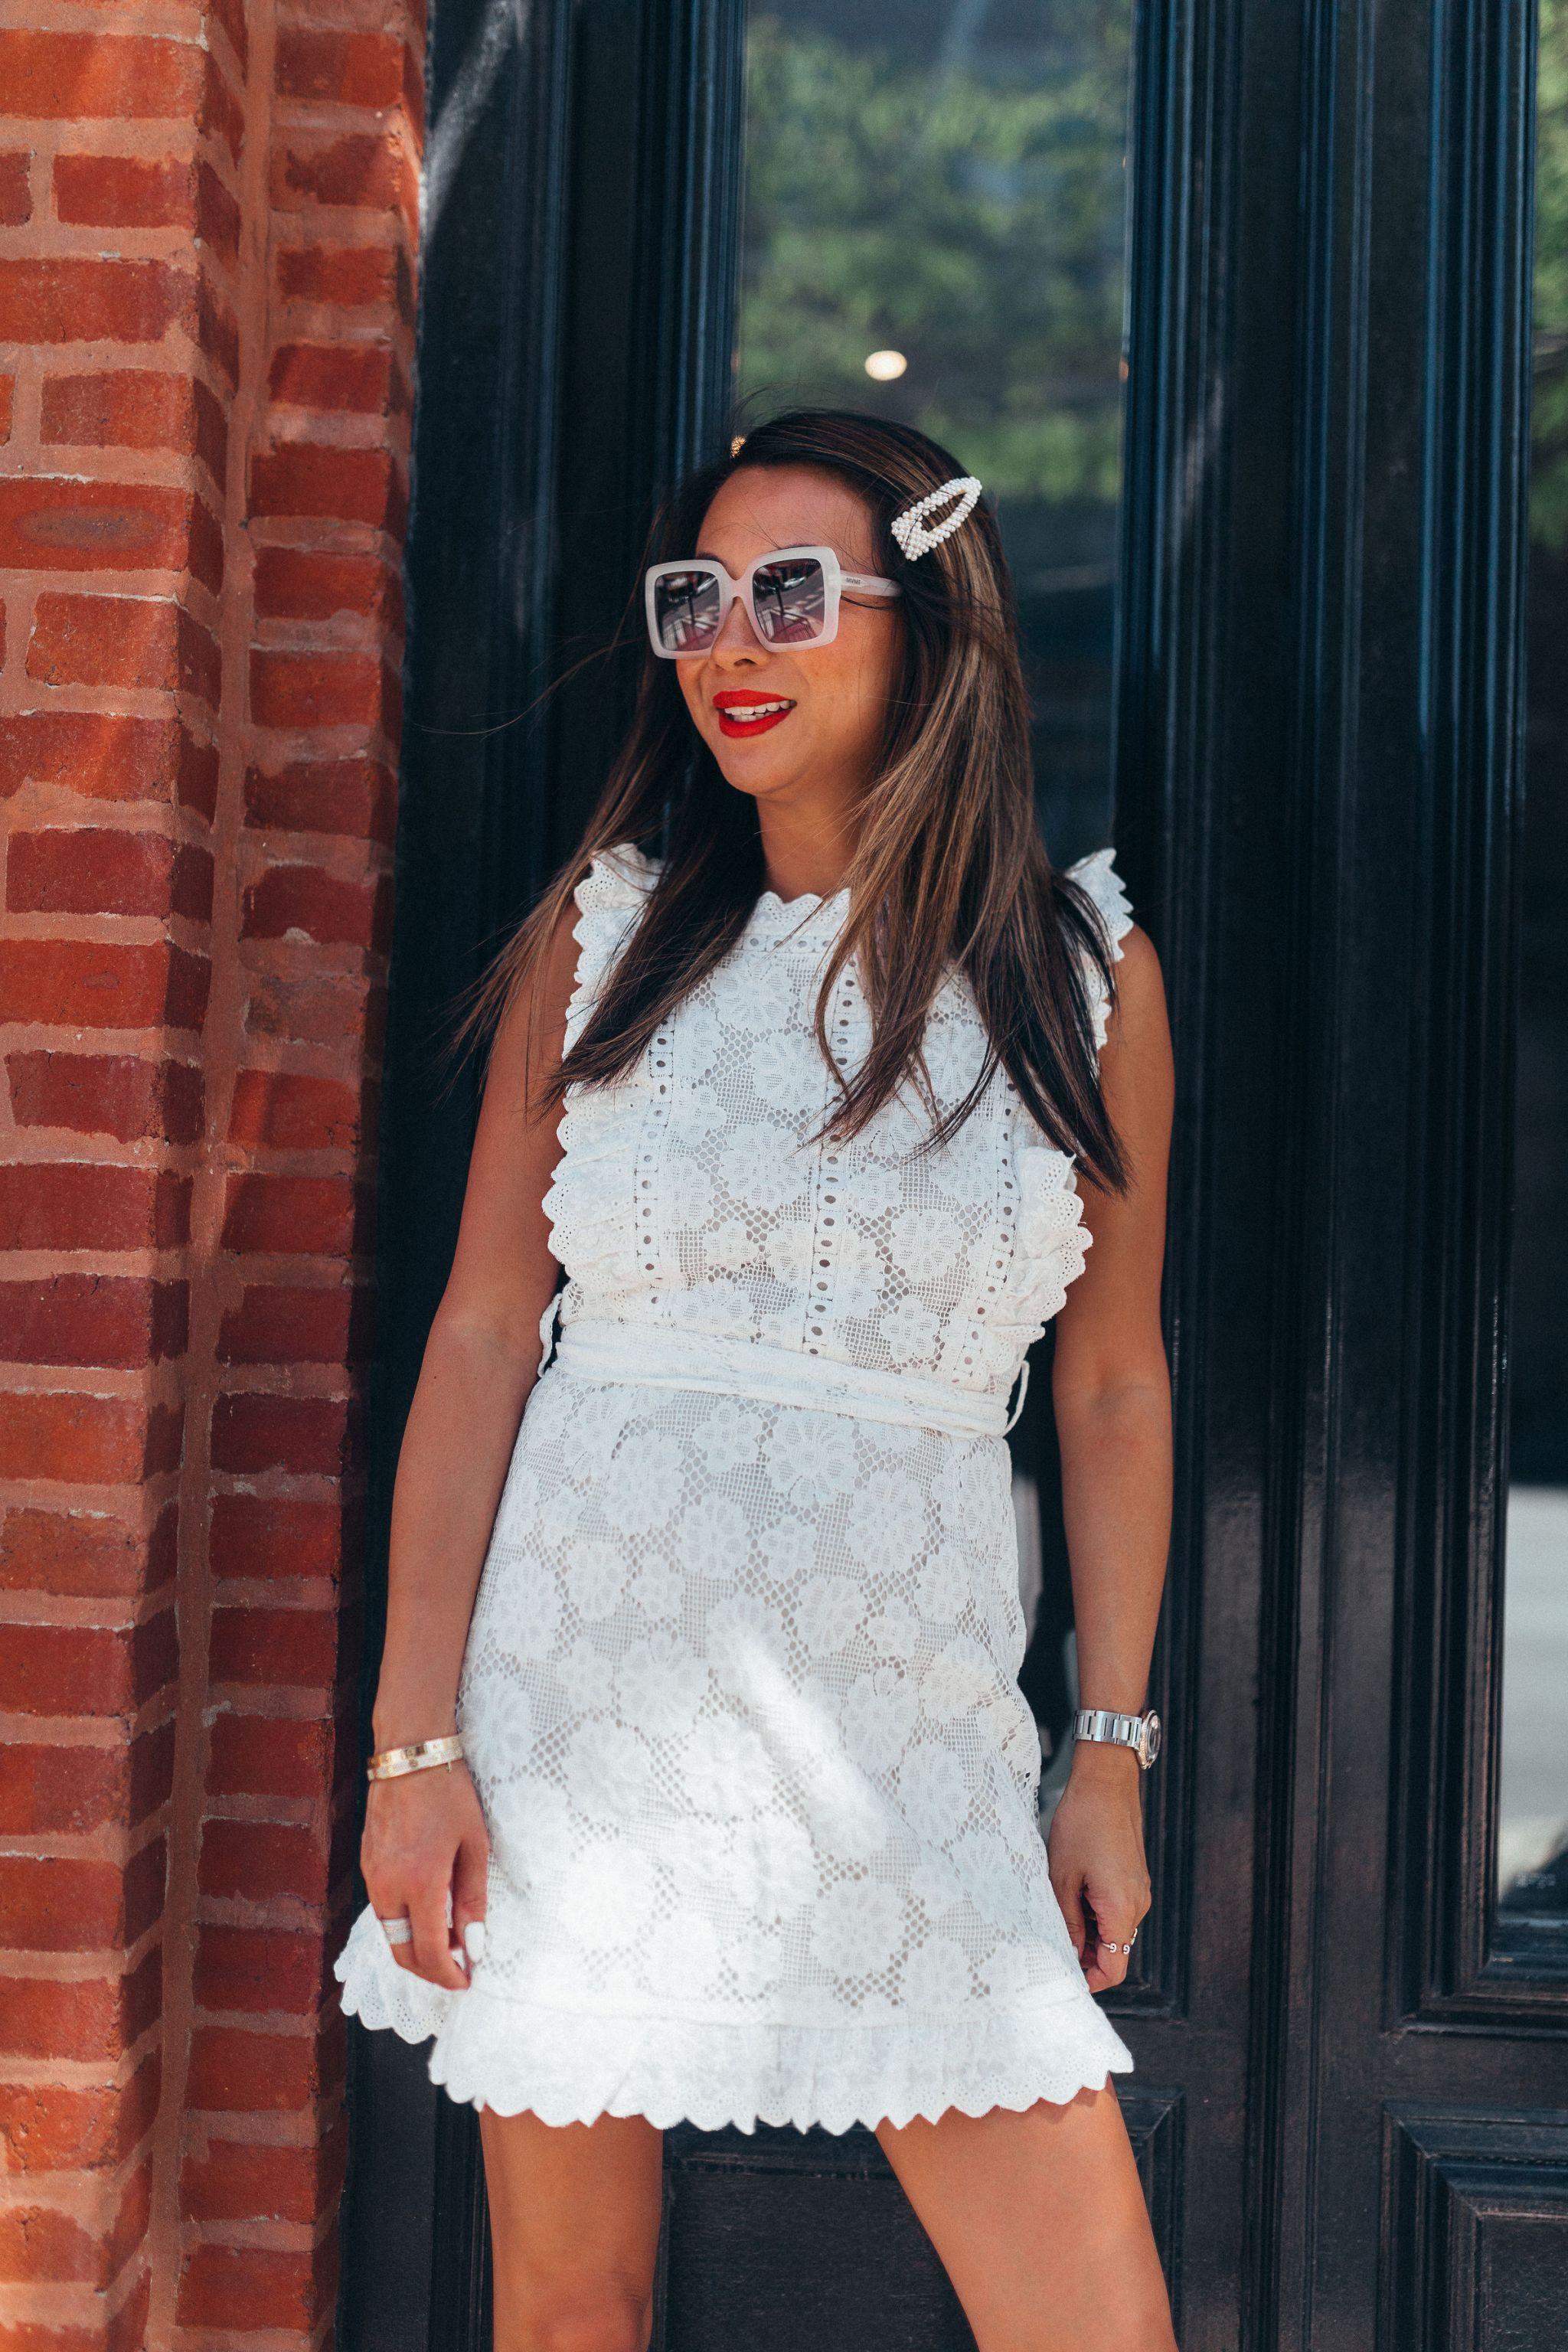 amazon fashion, white eyelet dress, white dress for summer, best amazon white dress, what to wear in the summer, chicago summer style, Jennifer Worman, Best Chicago Fashion Blog, Best Chicago Mom Blogger, Be, White Dresses for Summer